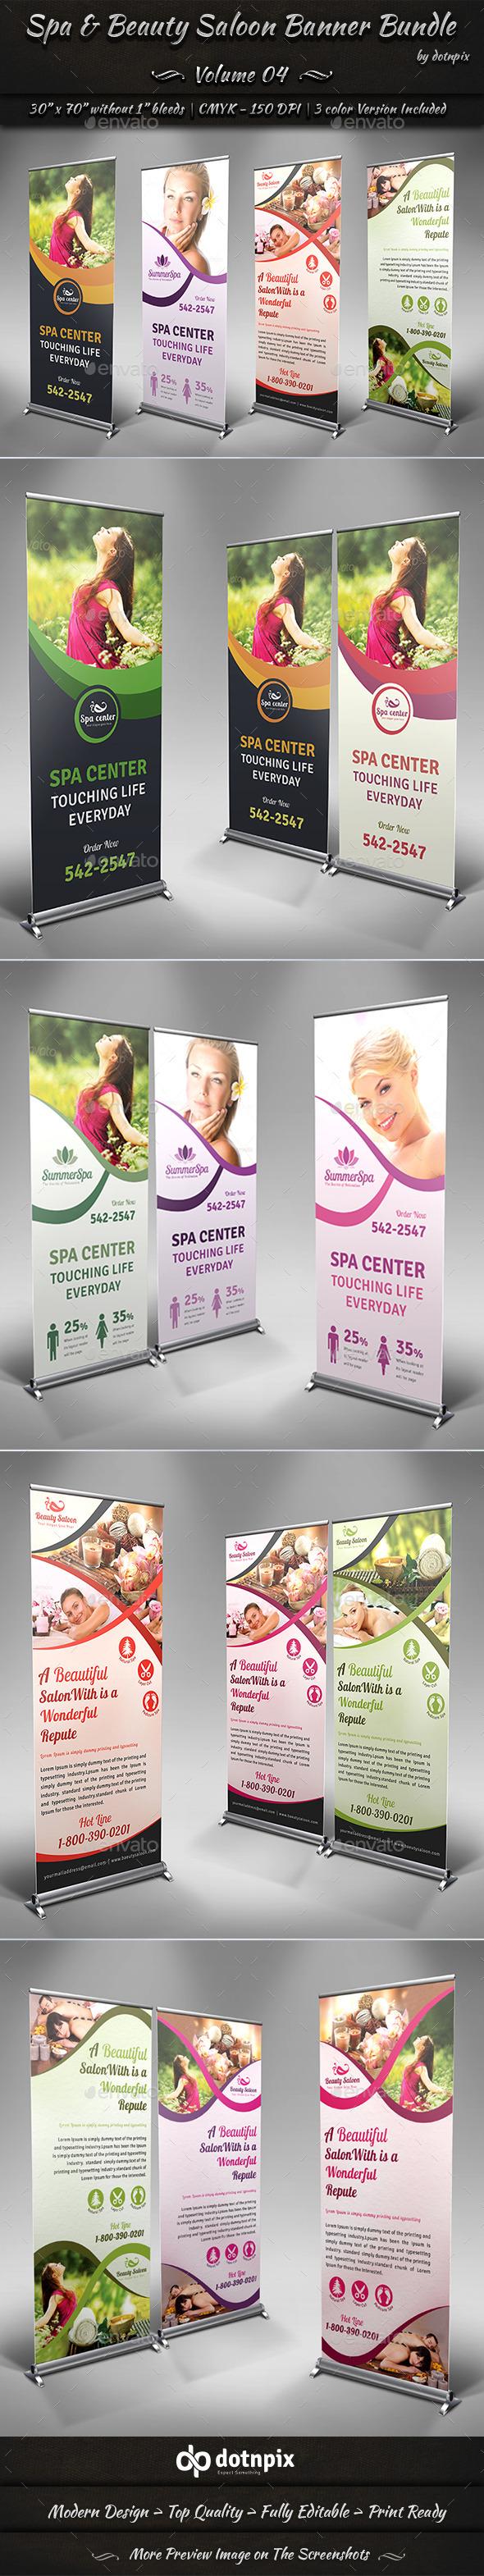 Beauty Salon Banner Graphics Designs Templates